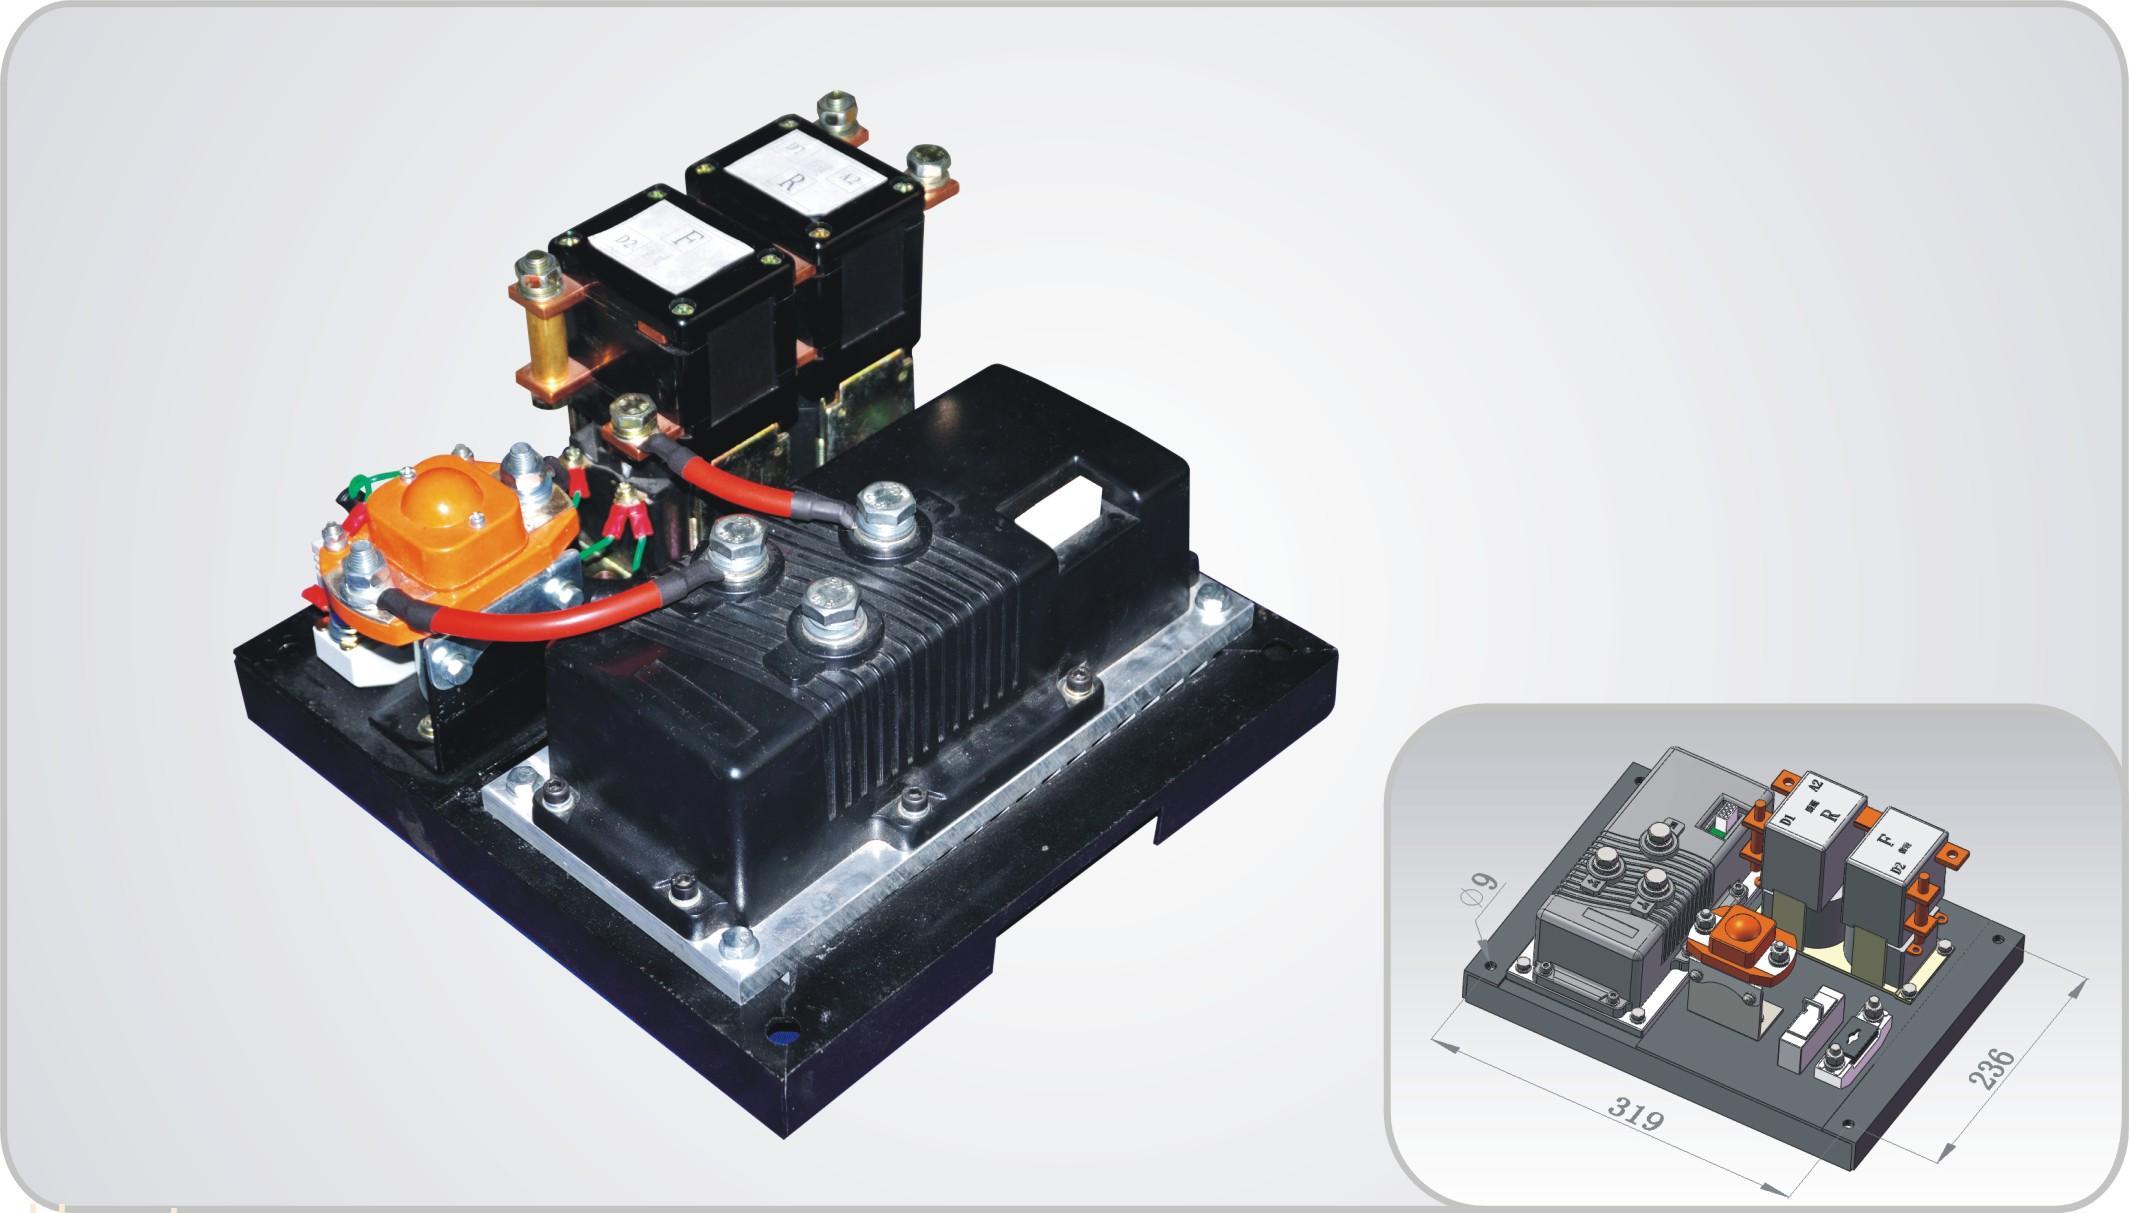 RAYW永磁无刷(直流无刷)电机控制器